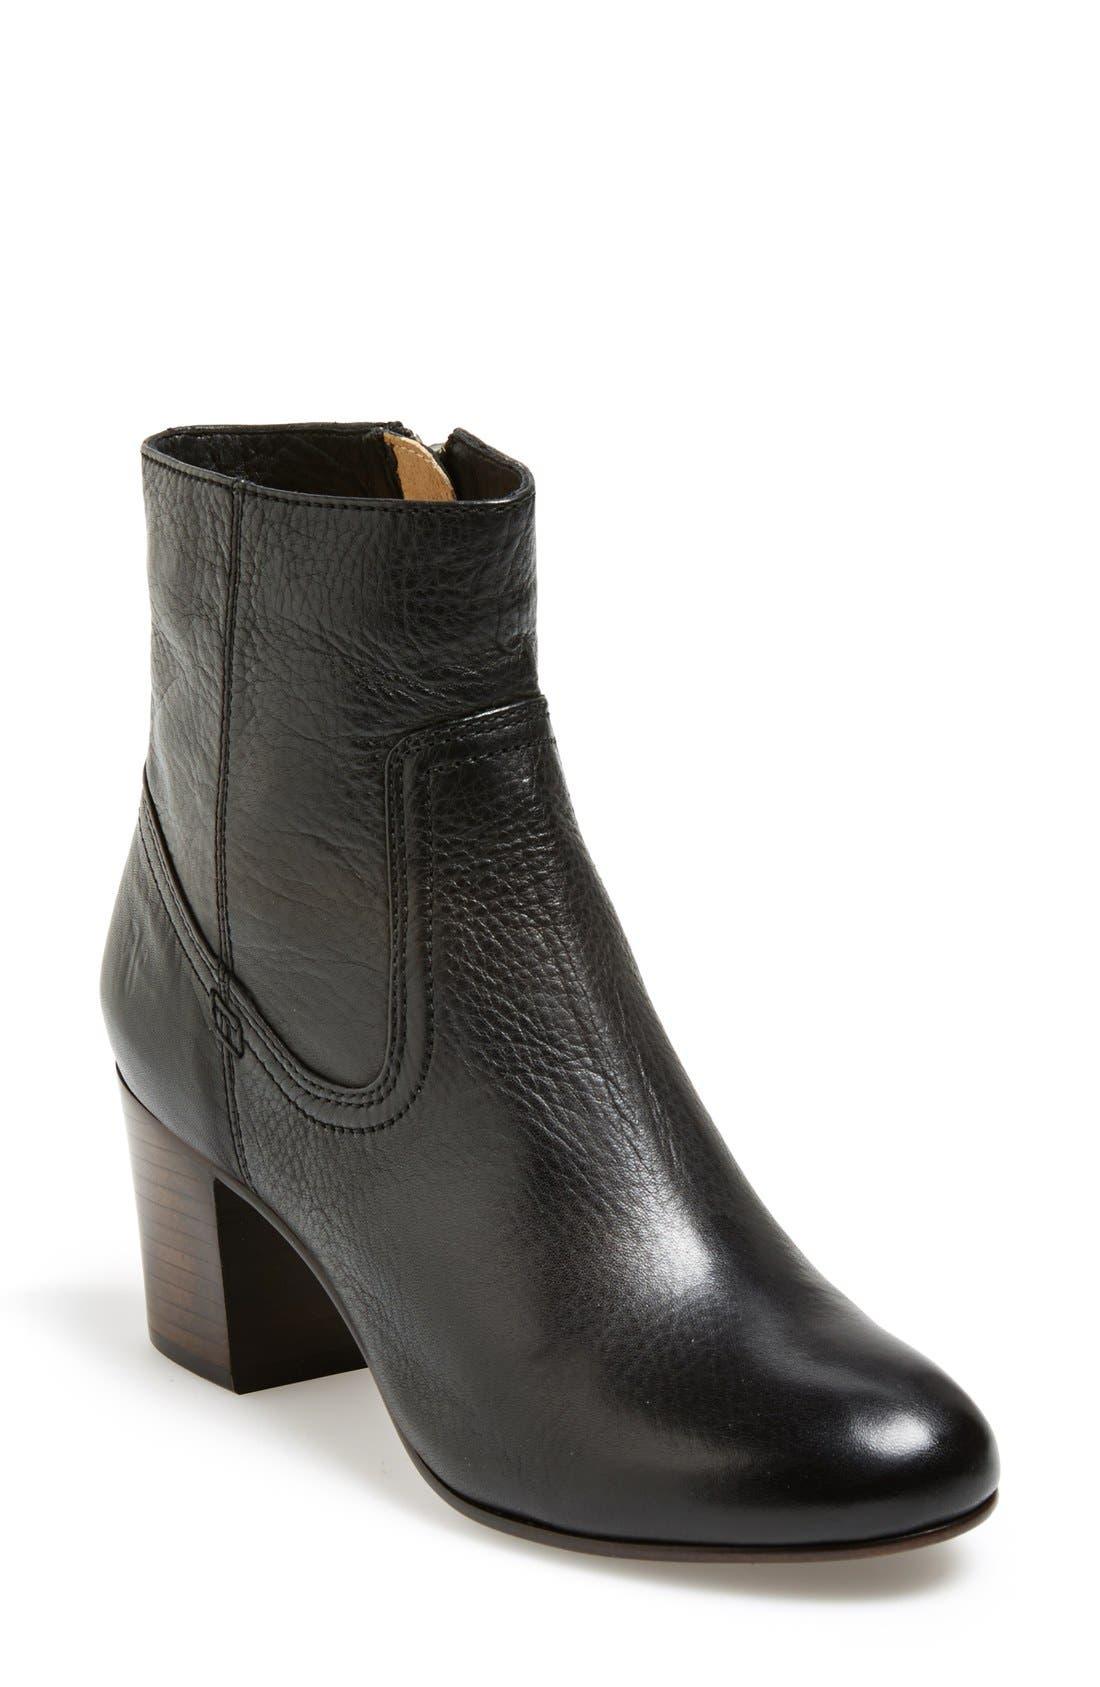 Main Image - Frye 'Stella' Zip Short Boot (Women)